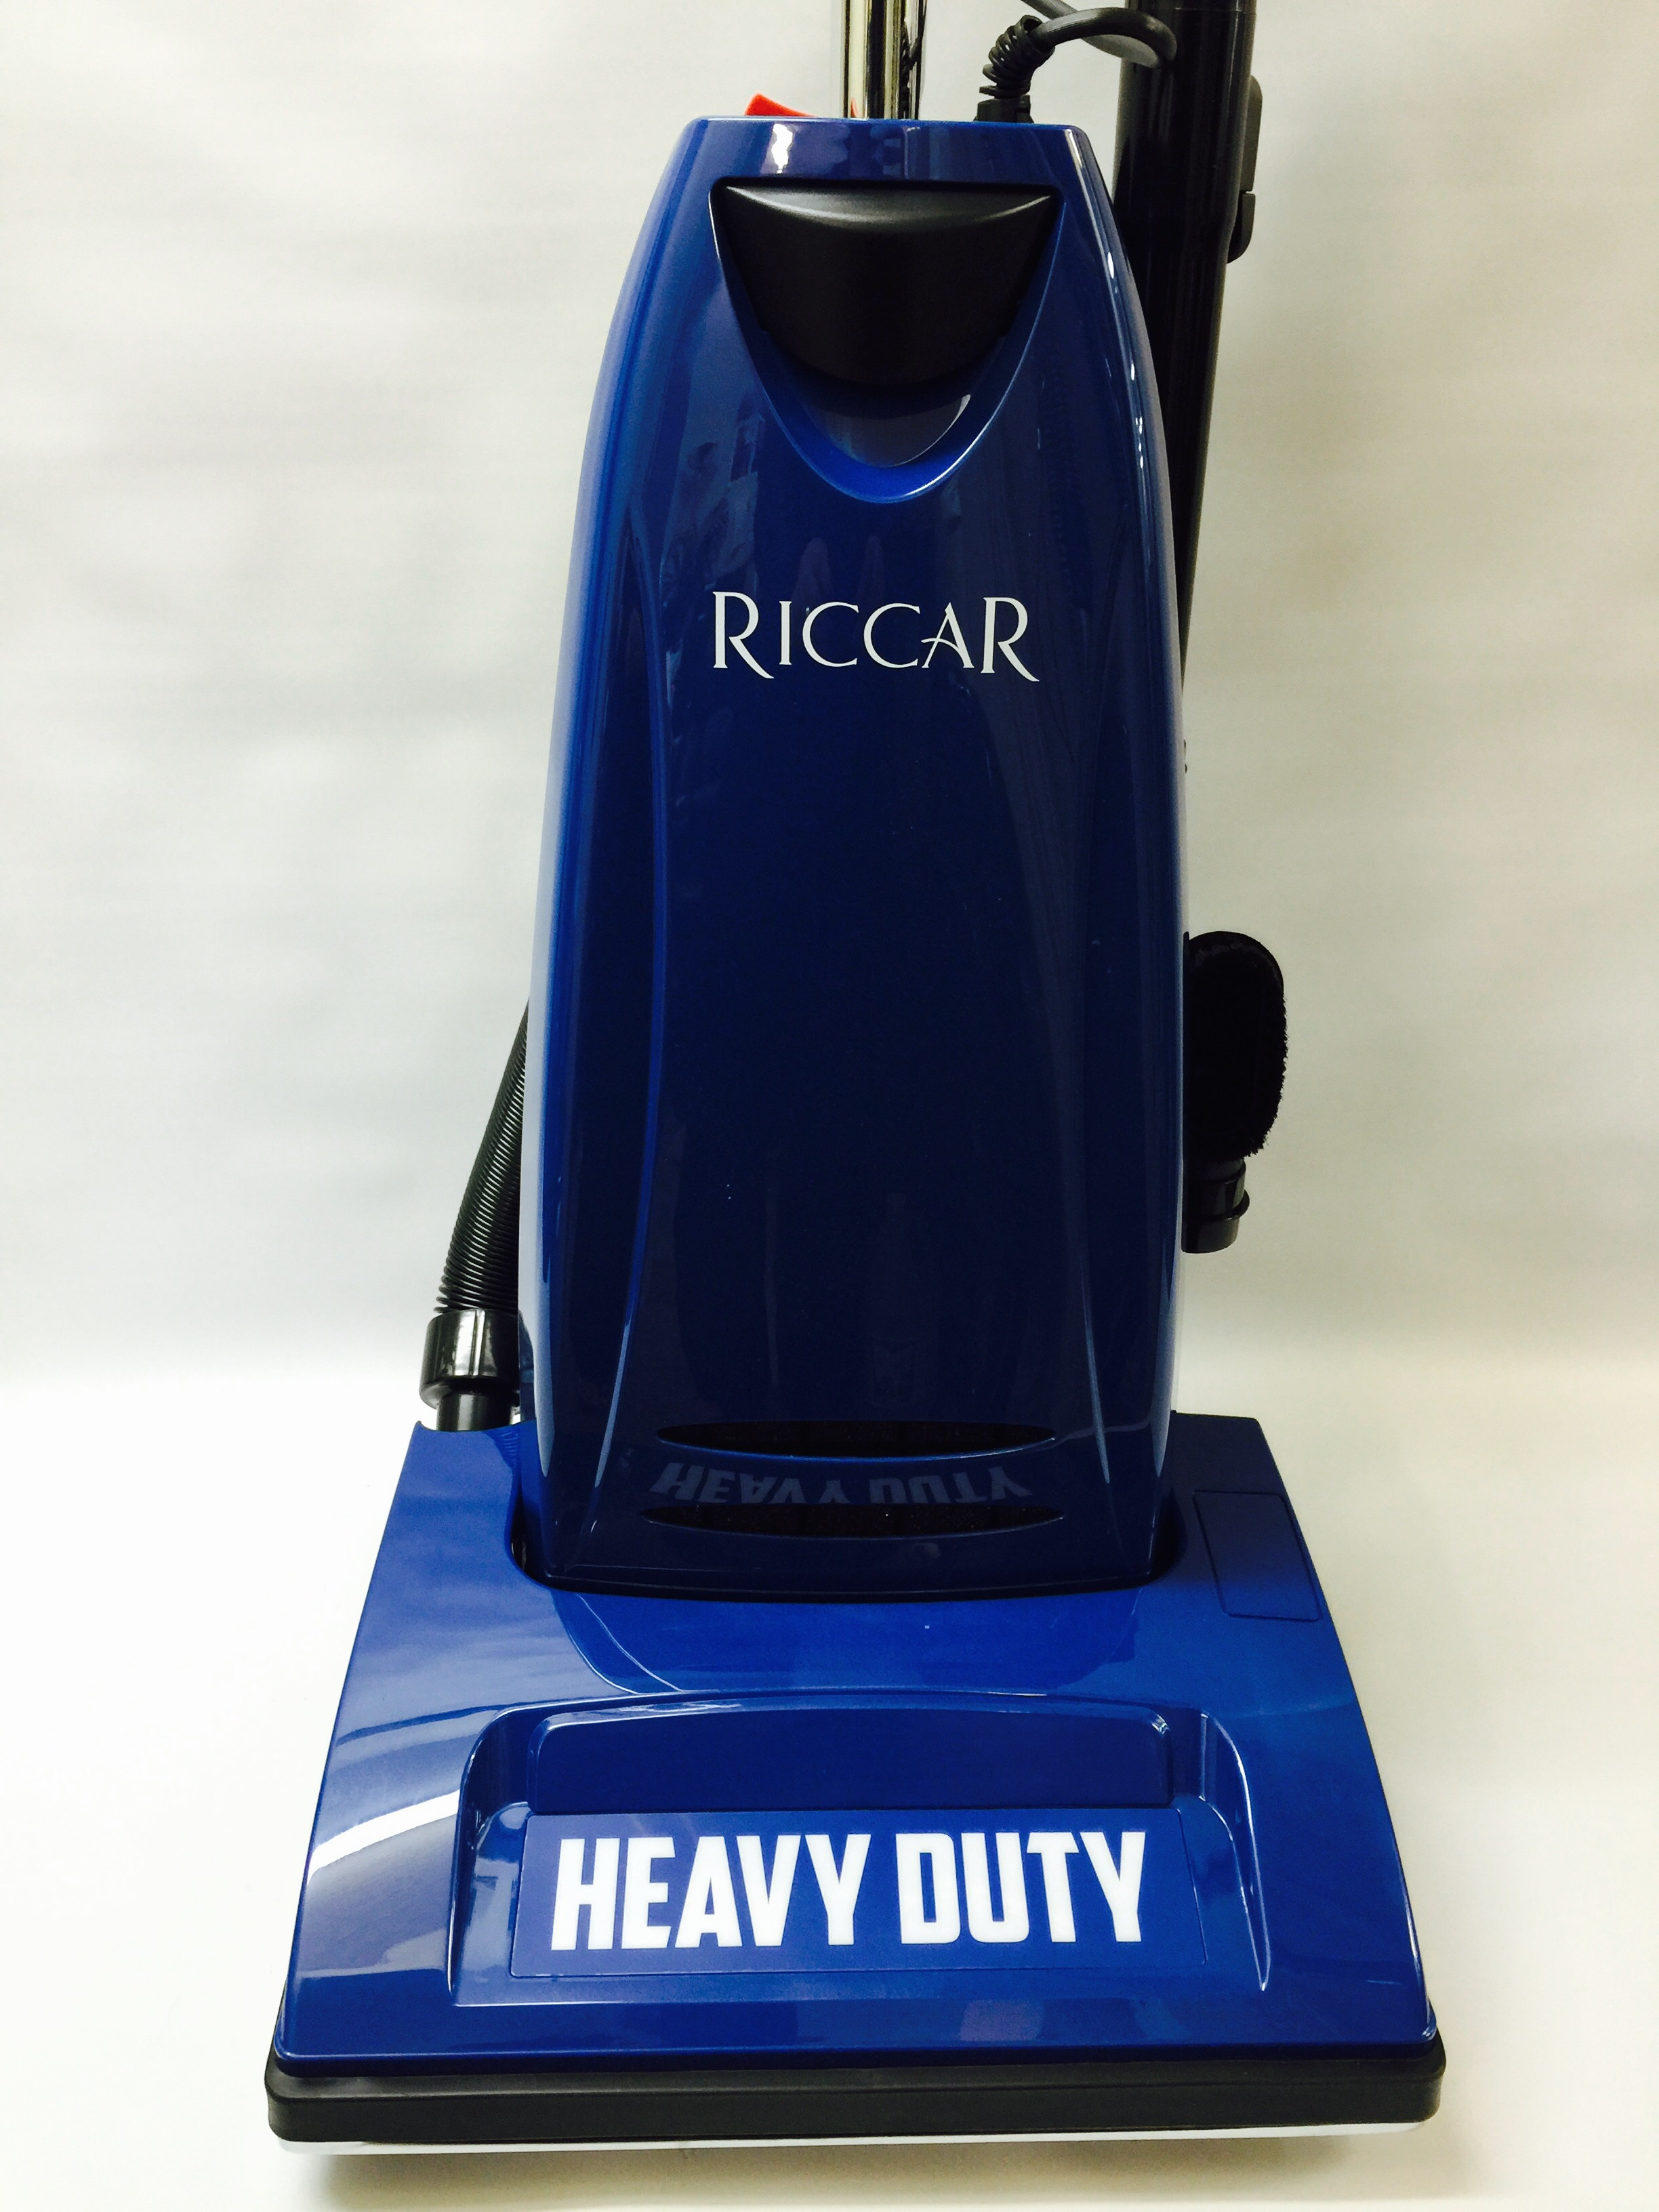 Riccar Heavy Duty Upright Vacuum Cleaner